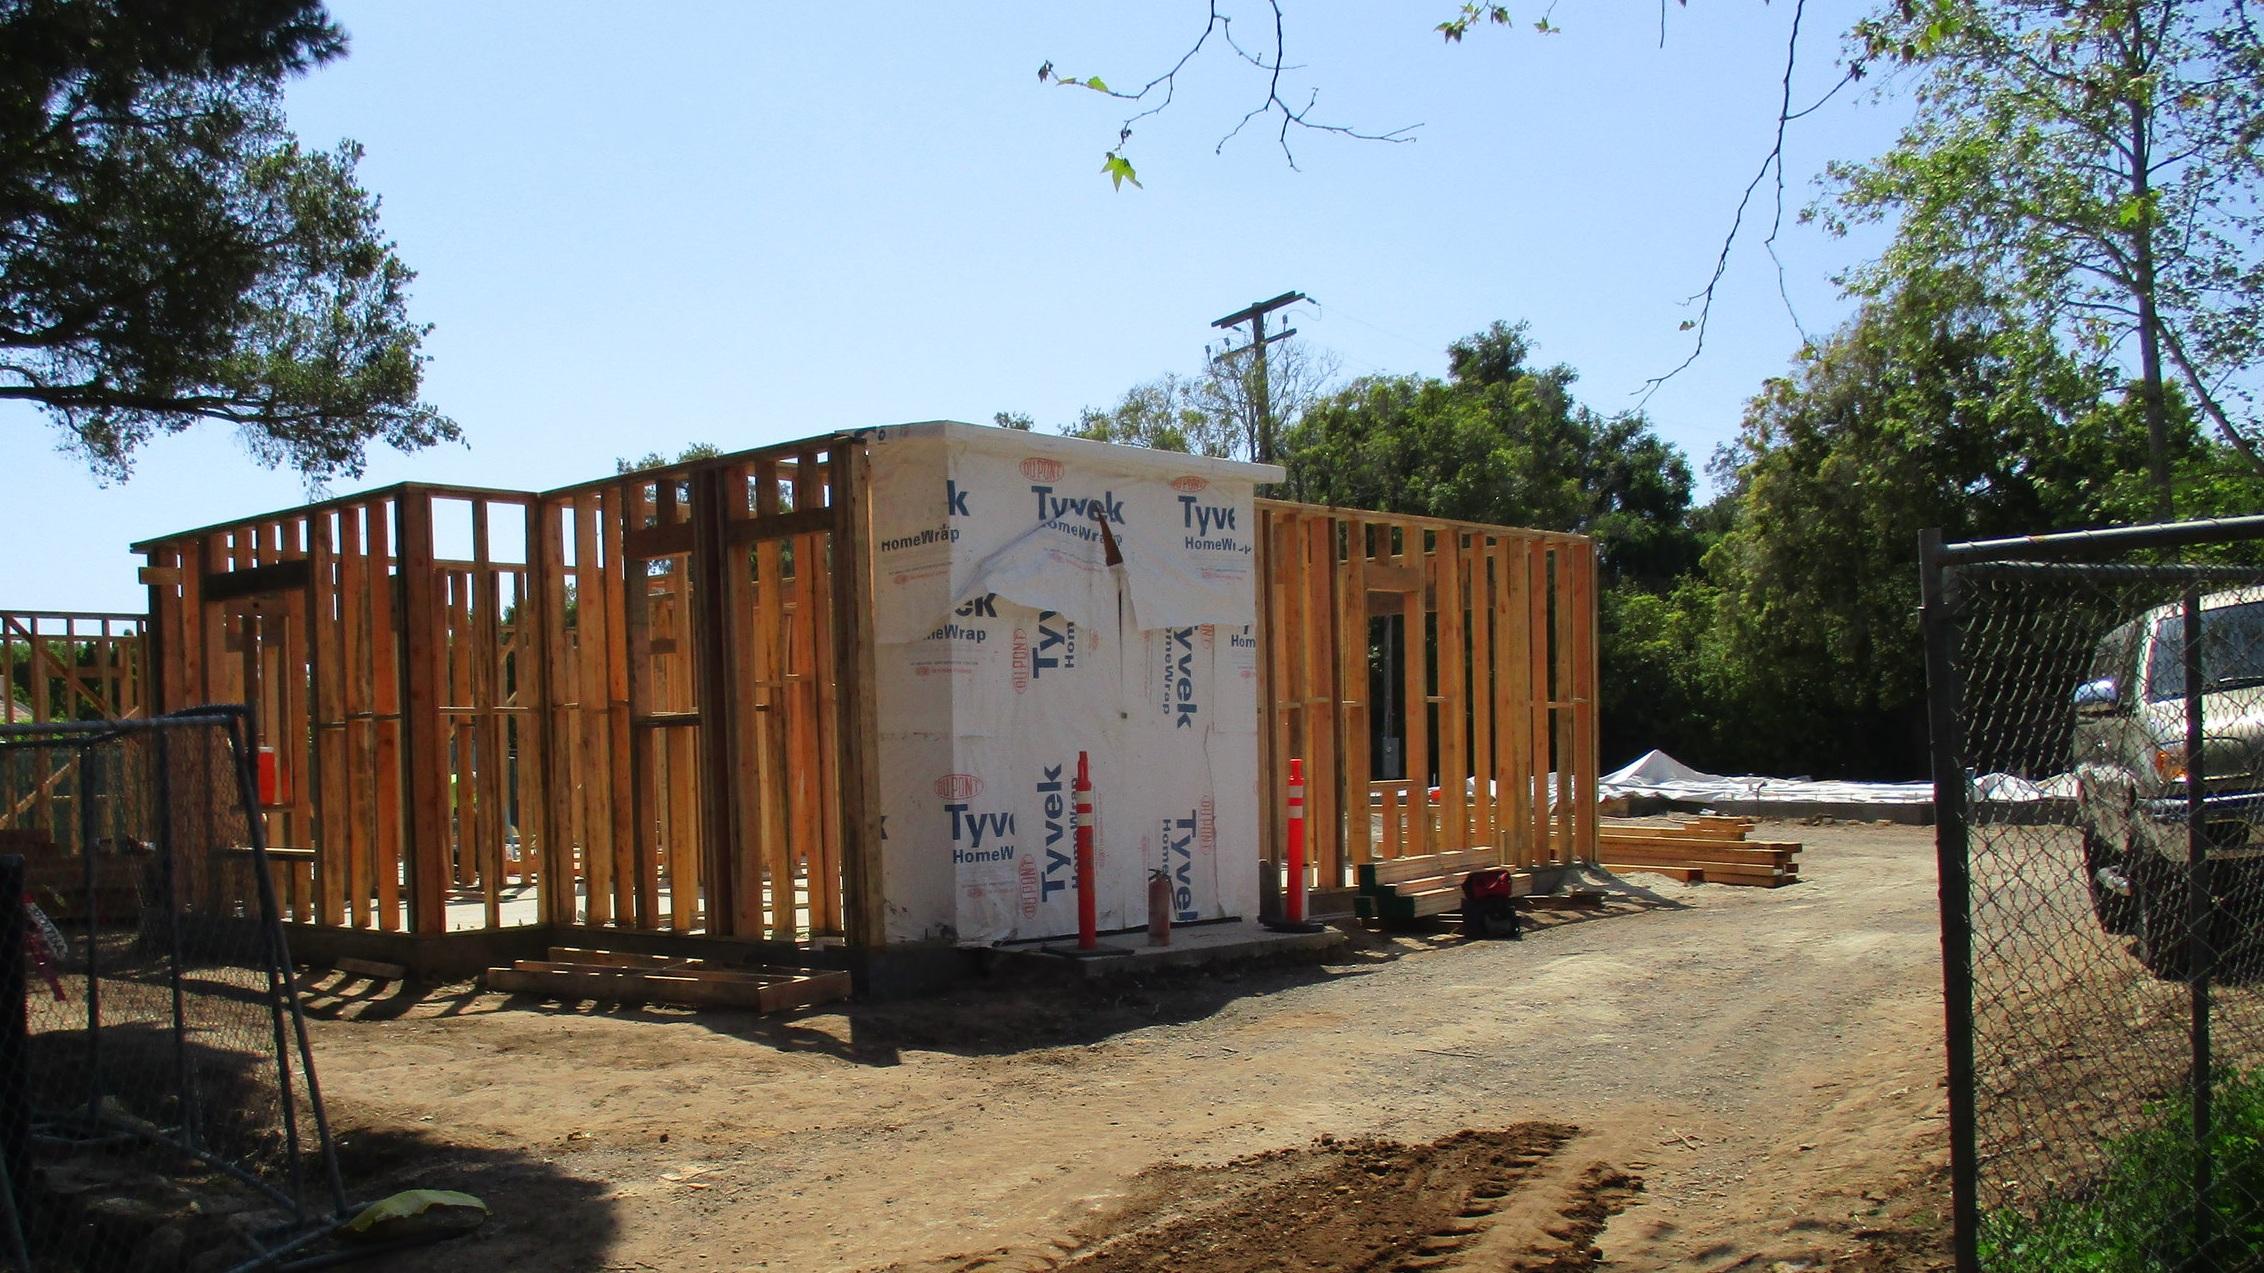 Casa Dorinda, North Villas, 4/2/19  Framing underway